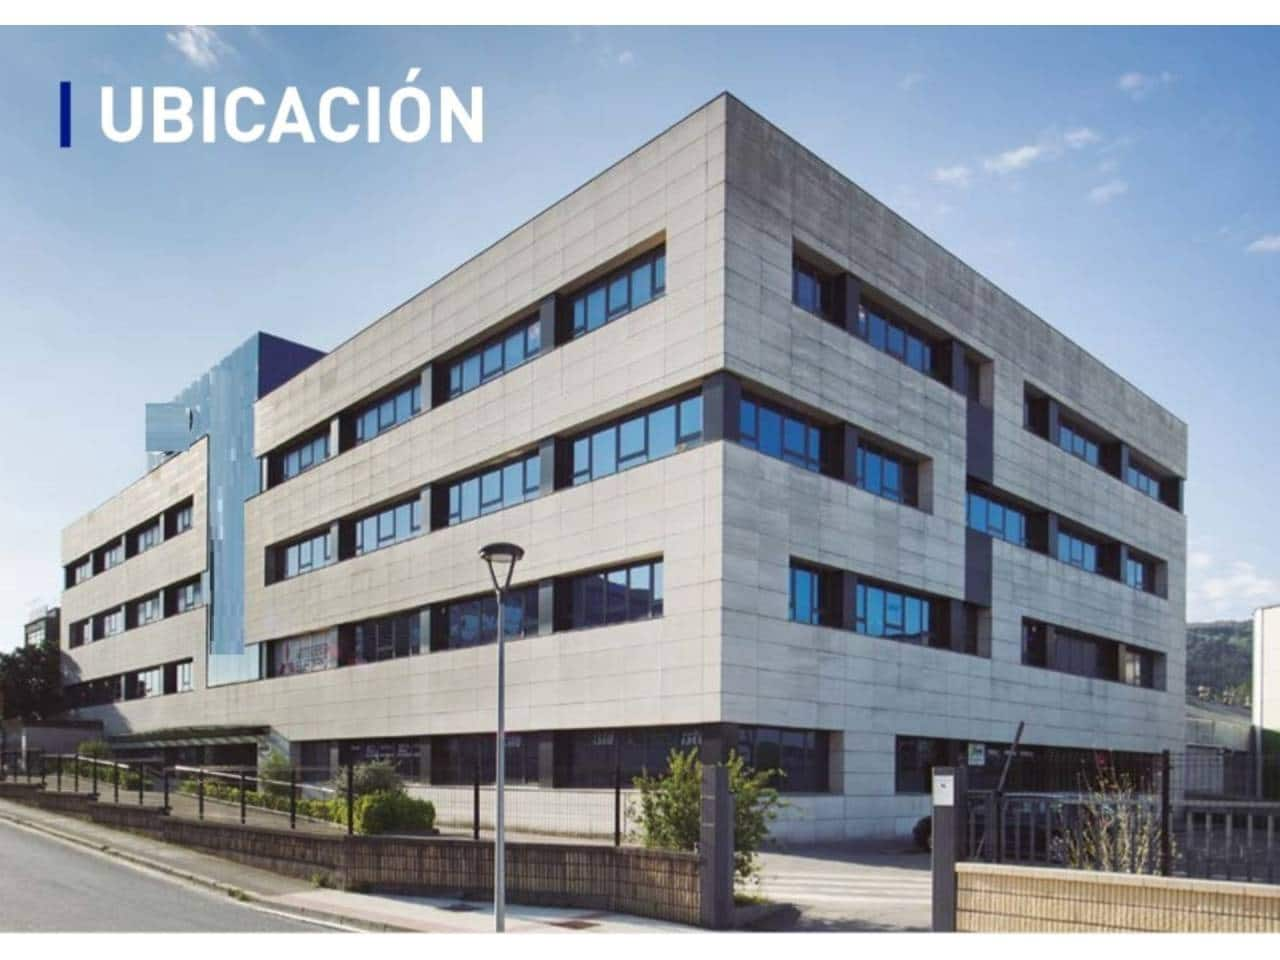 13 chambre Bureau à vendre à Derio avec garage - 600 000 € (Ref: 5711043)